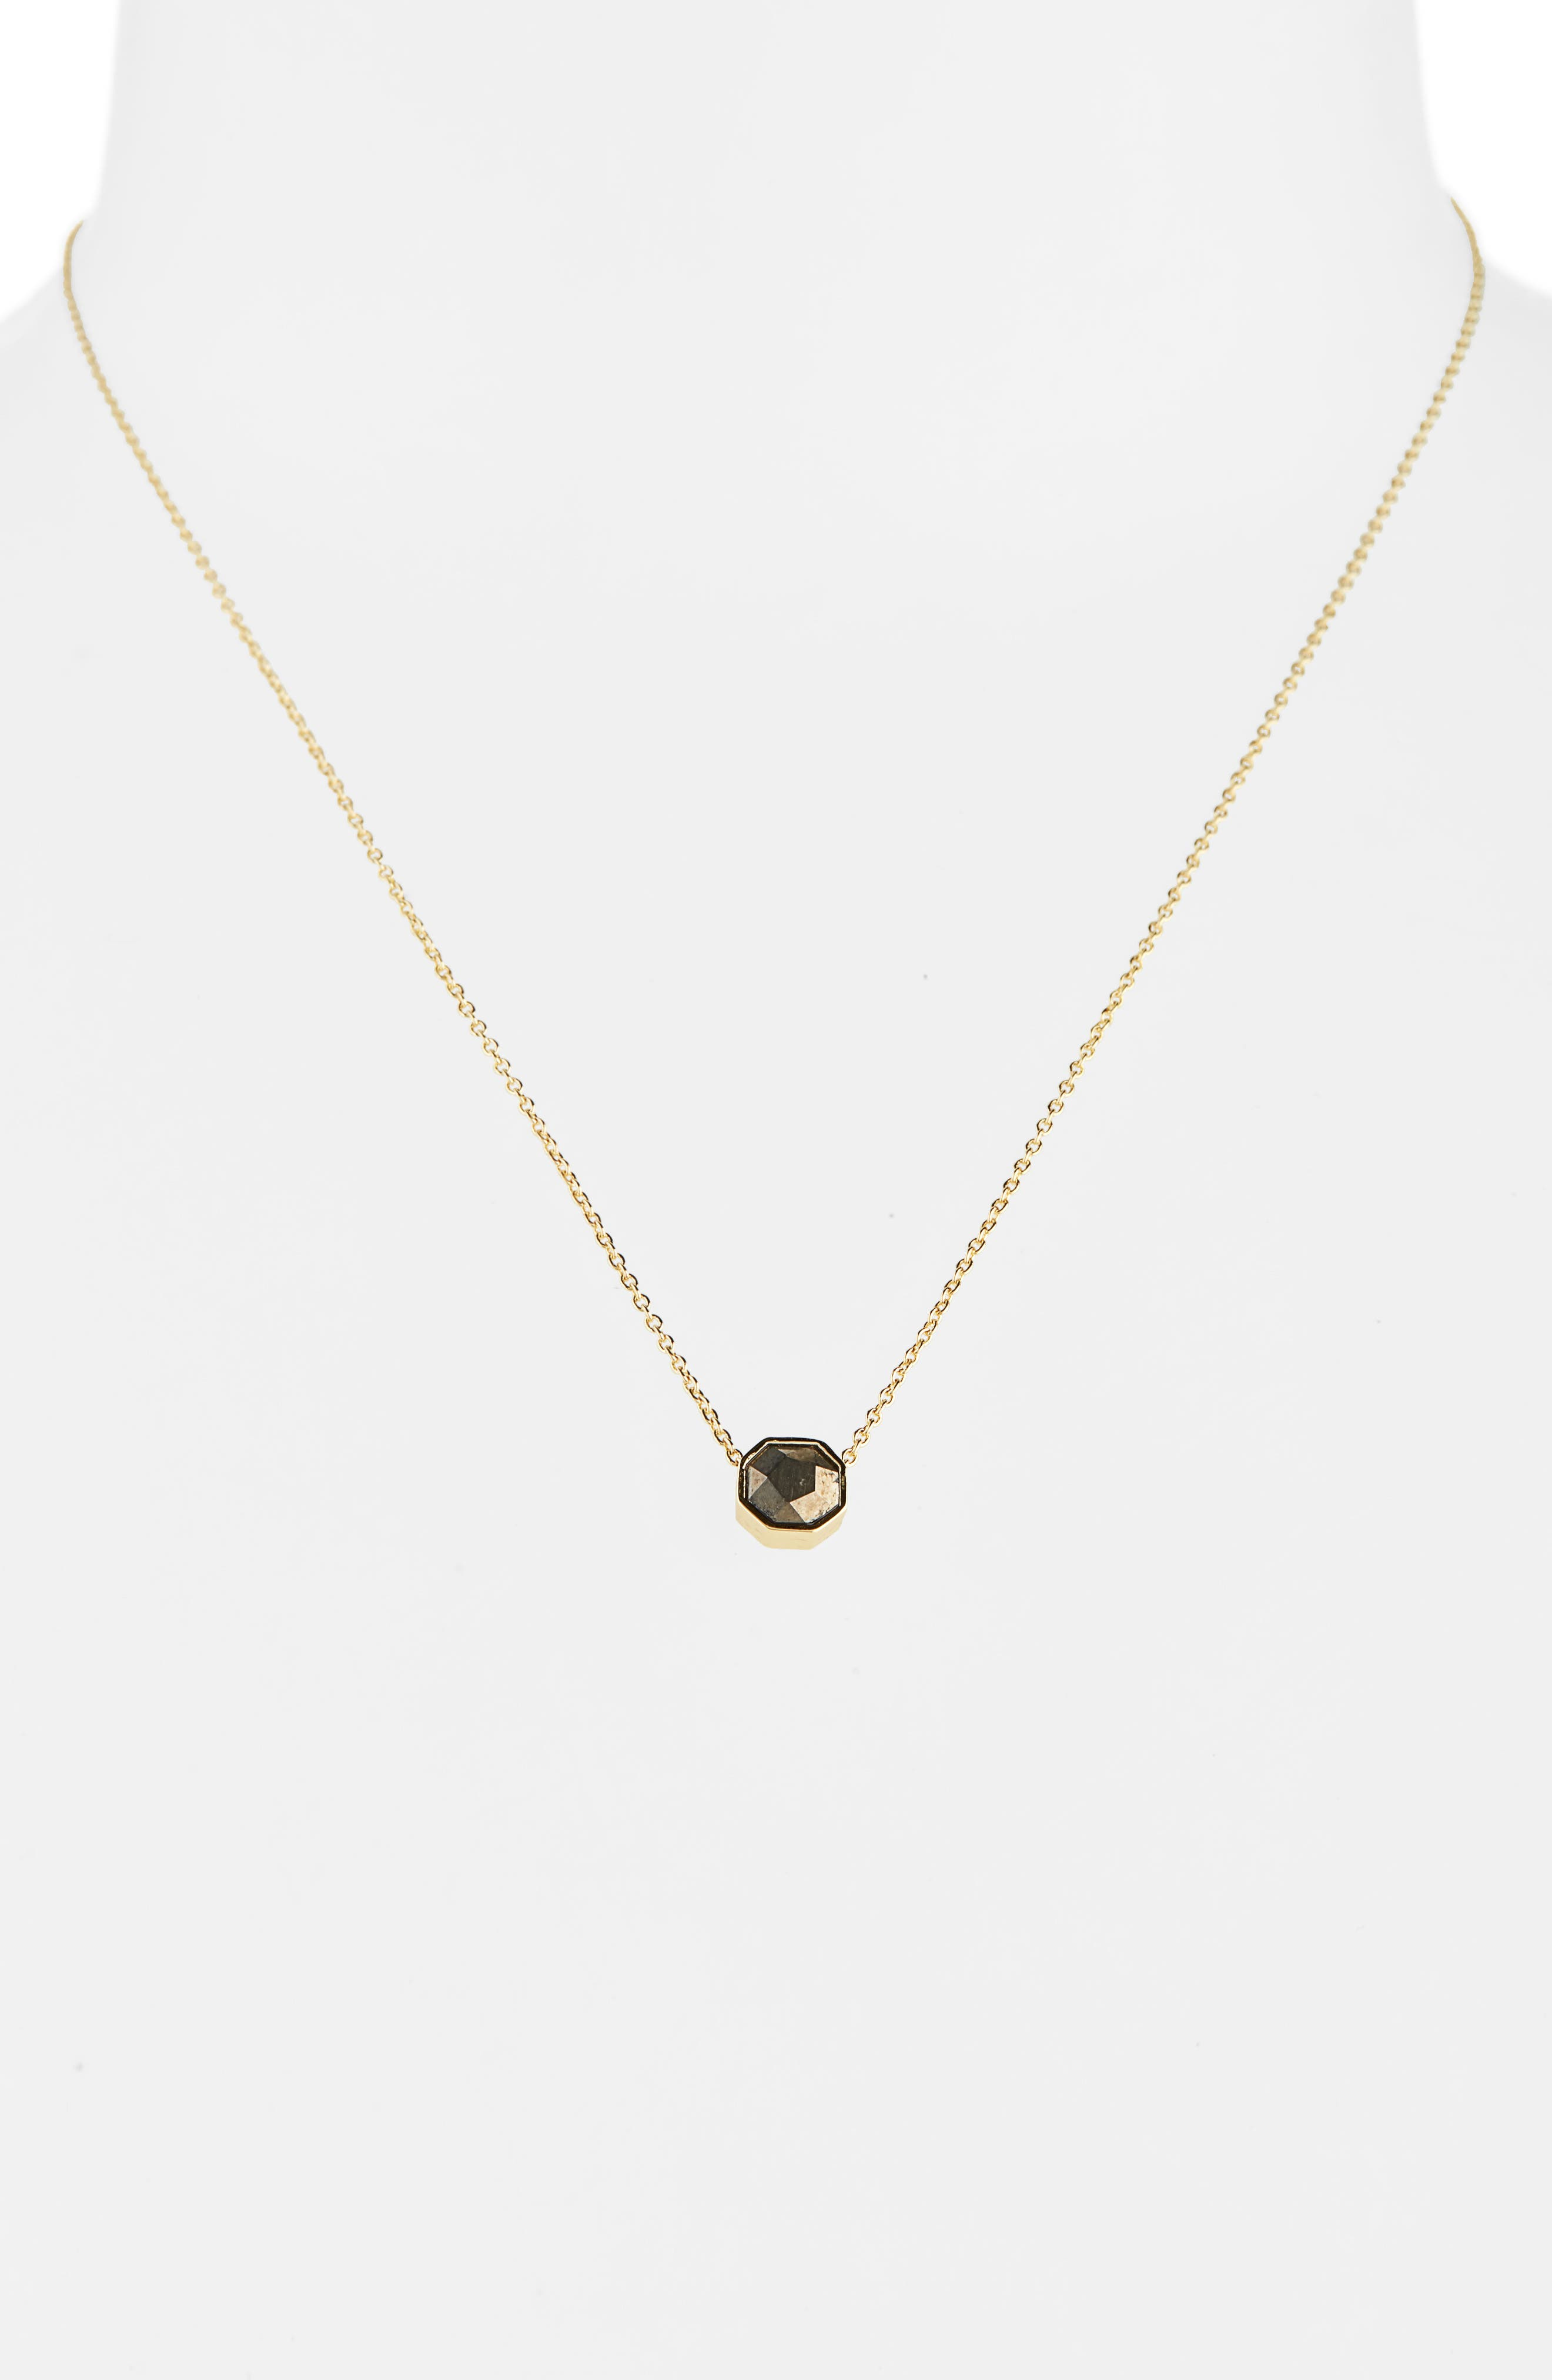 GORJANA, Power Gemstone Charm Adjustable Necklace, Main thumbnail 1, color, STRENGTH/ PYRITE/ GOLD